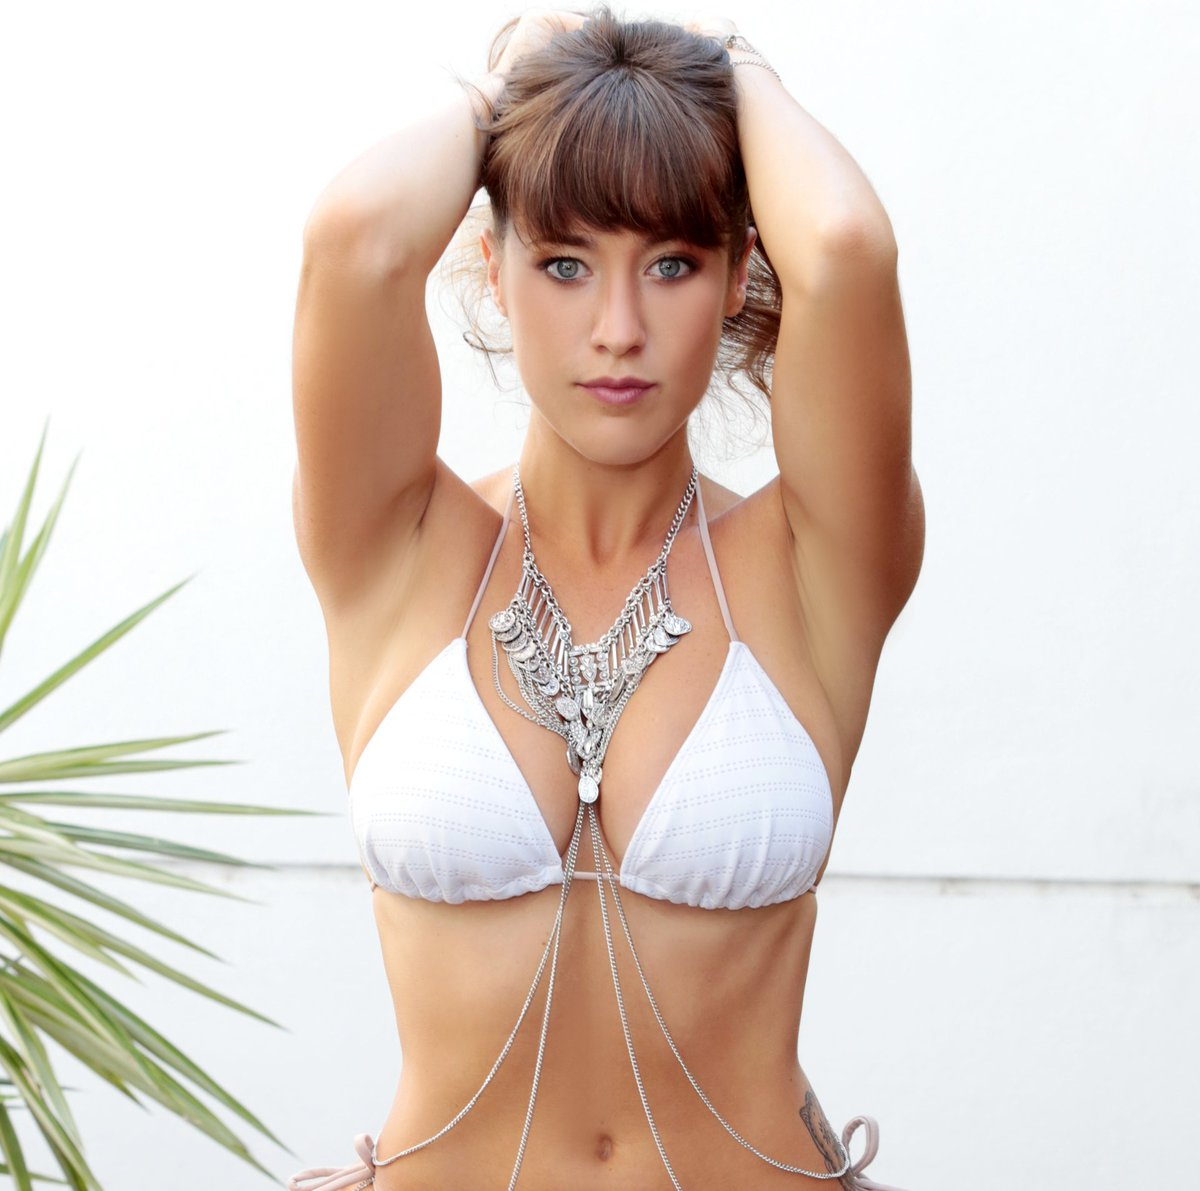 Sexy salazar 41 Sexiest